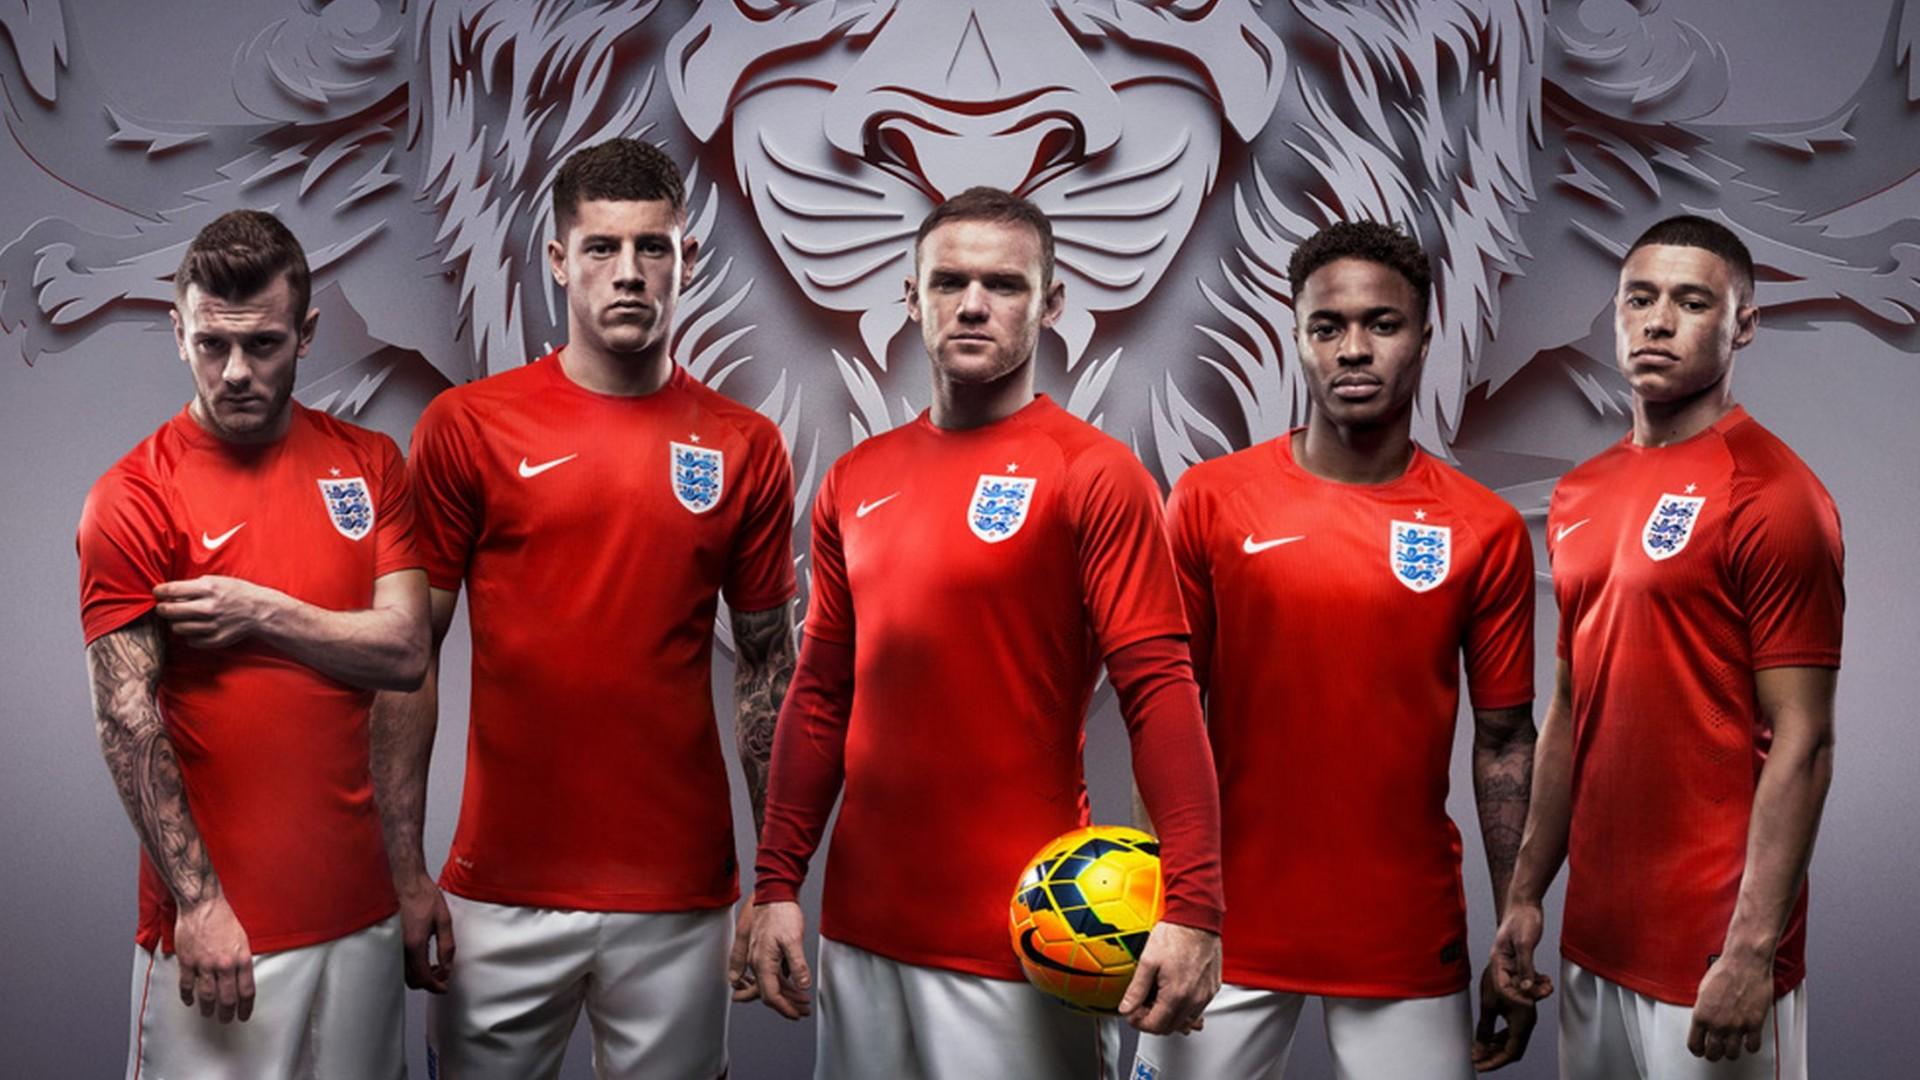 England Football Team Wallpapers 1920x1080